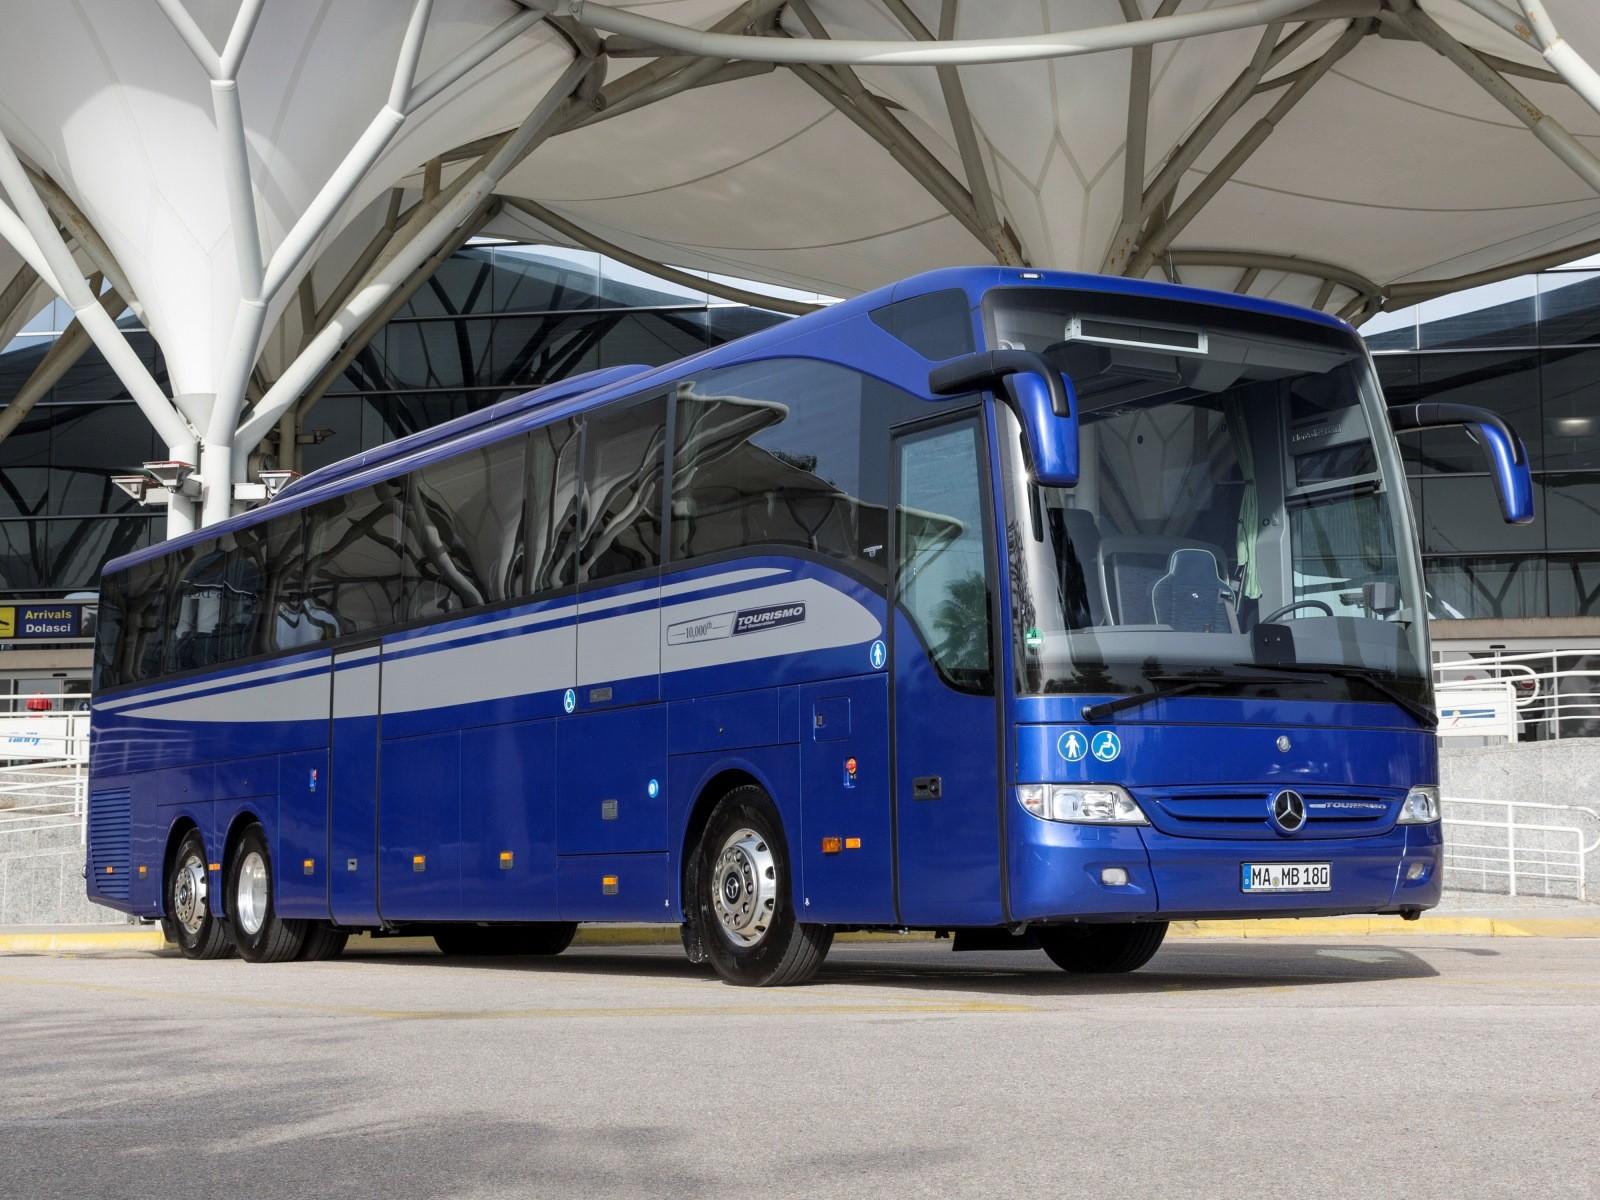 картинки камазов автобусов дереве своими